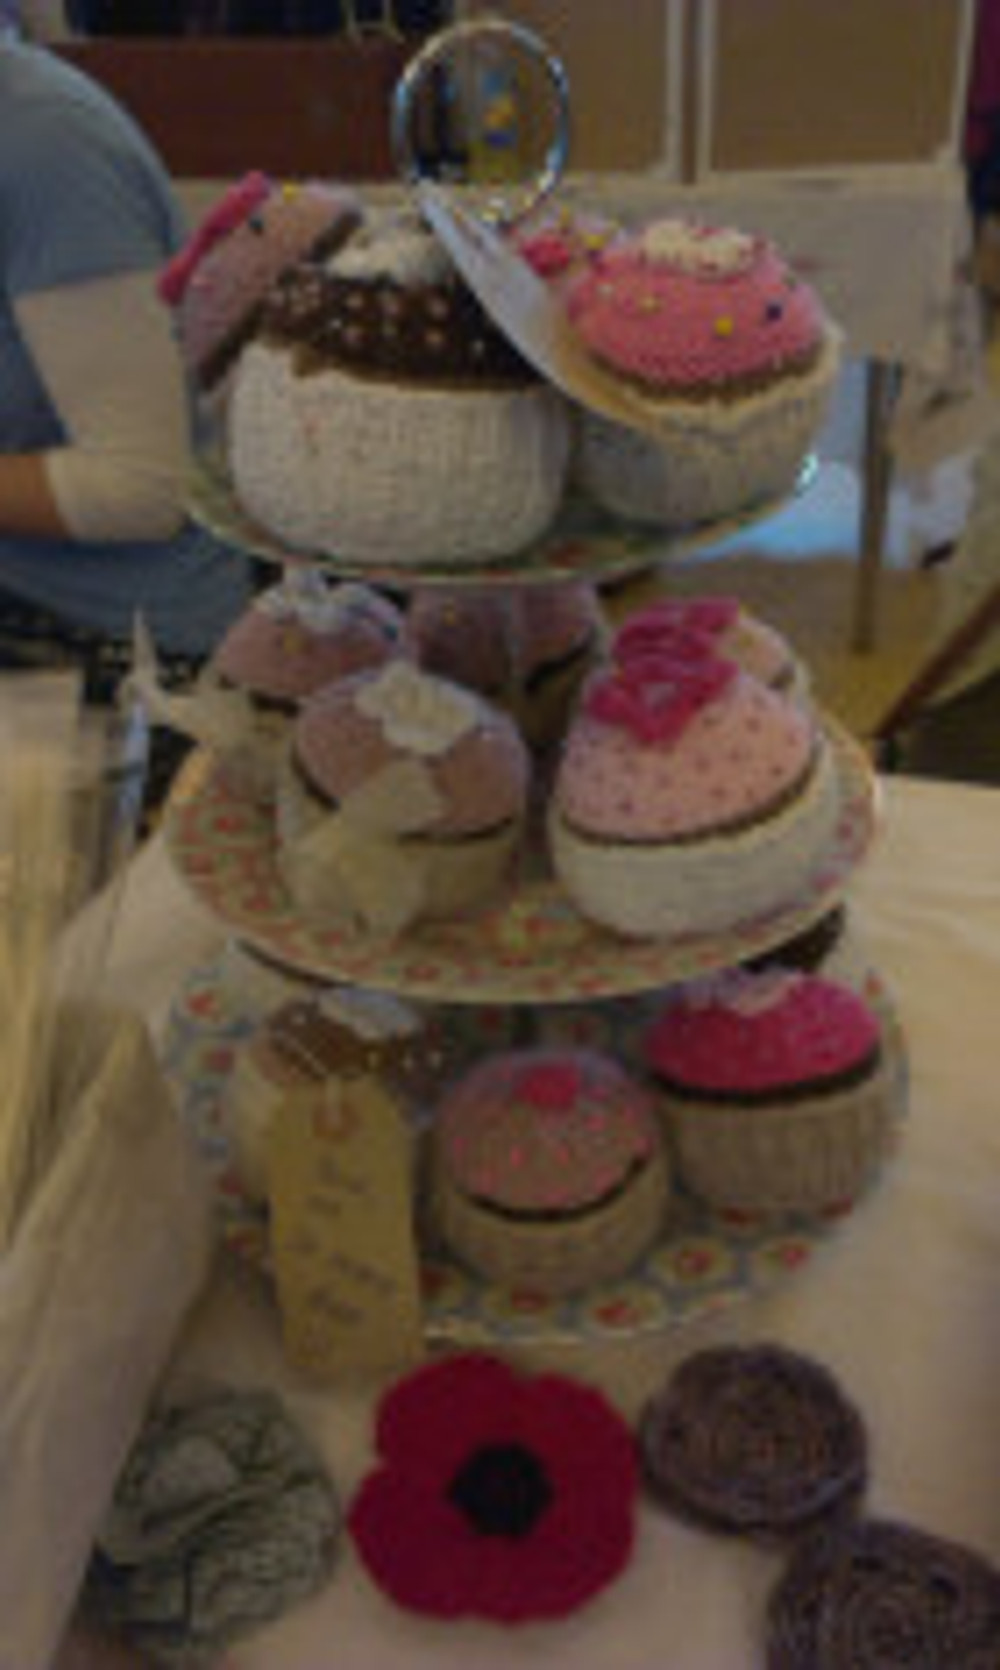 Helen's cupcake pincushions from Three Cotton Hankies